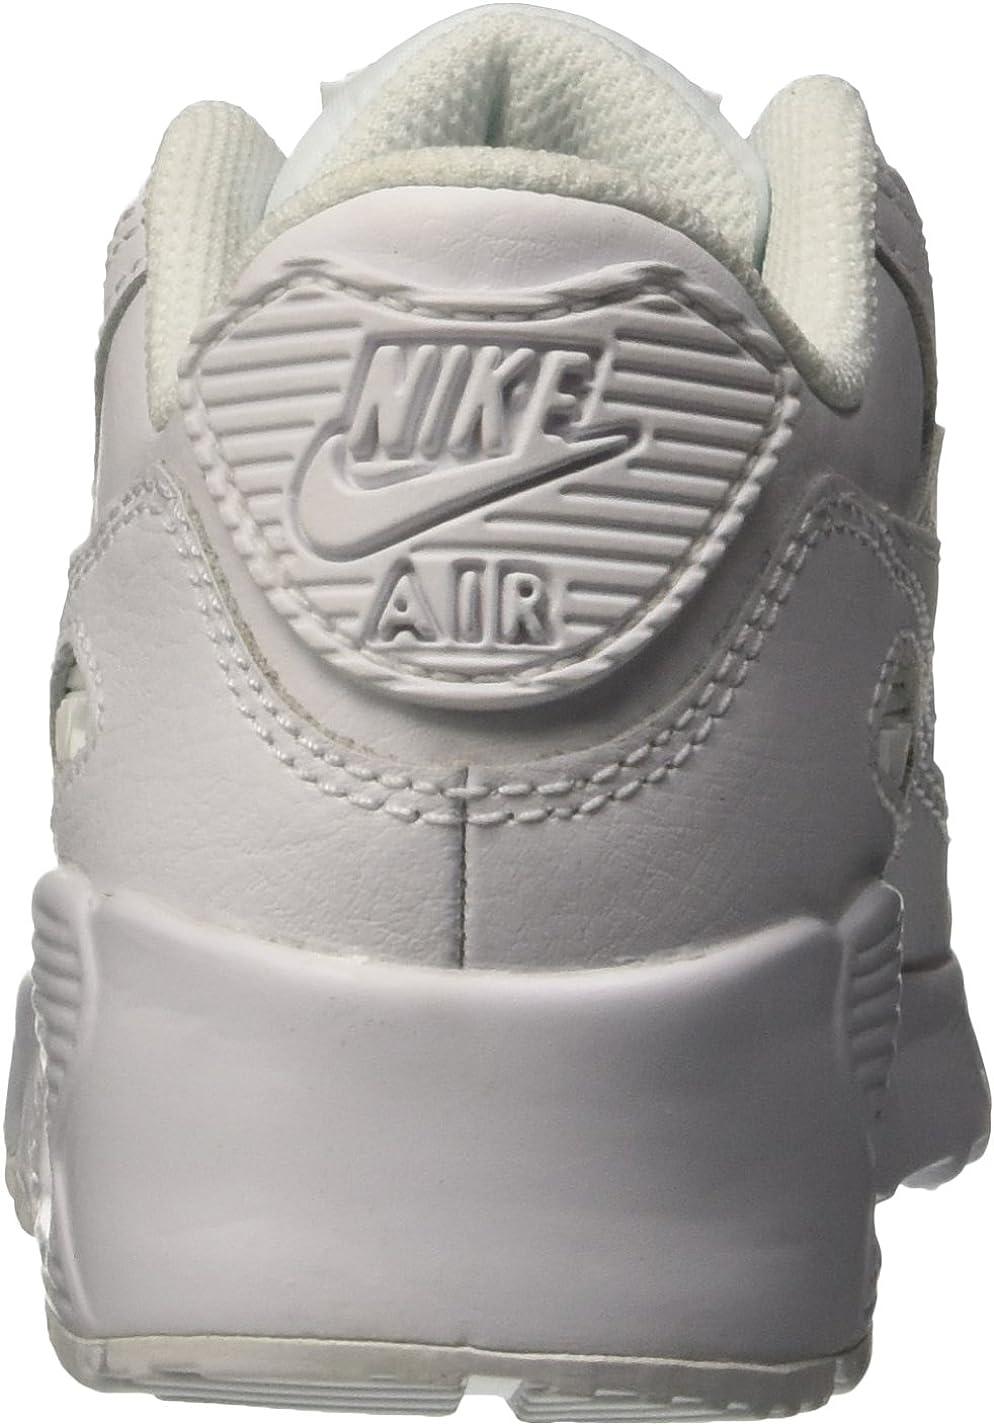 Nike Women's Air Max 90 Sneaker White/White